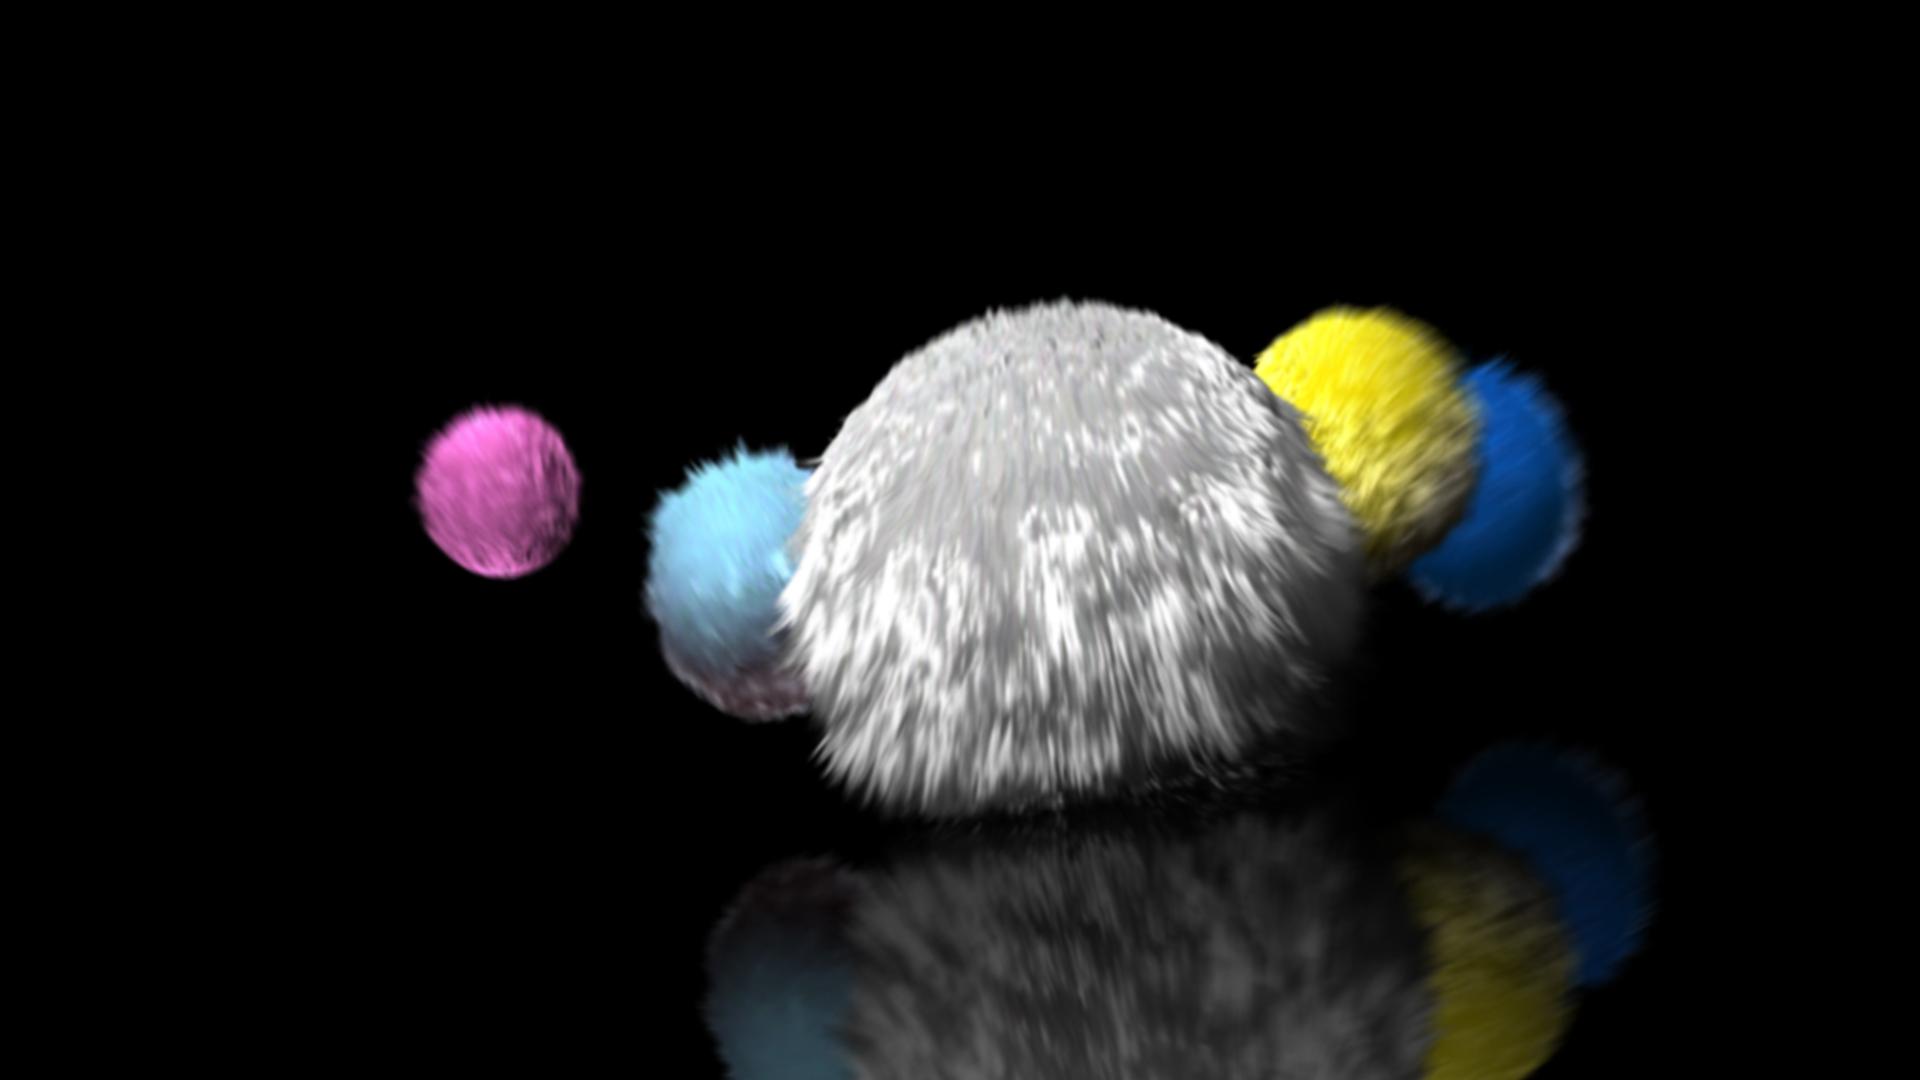 TMF_Hairy Balls